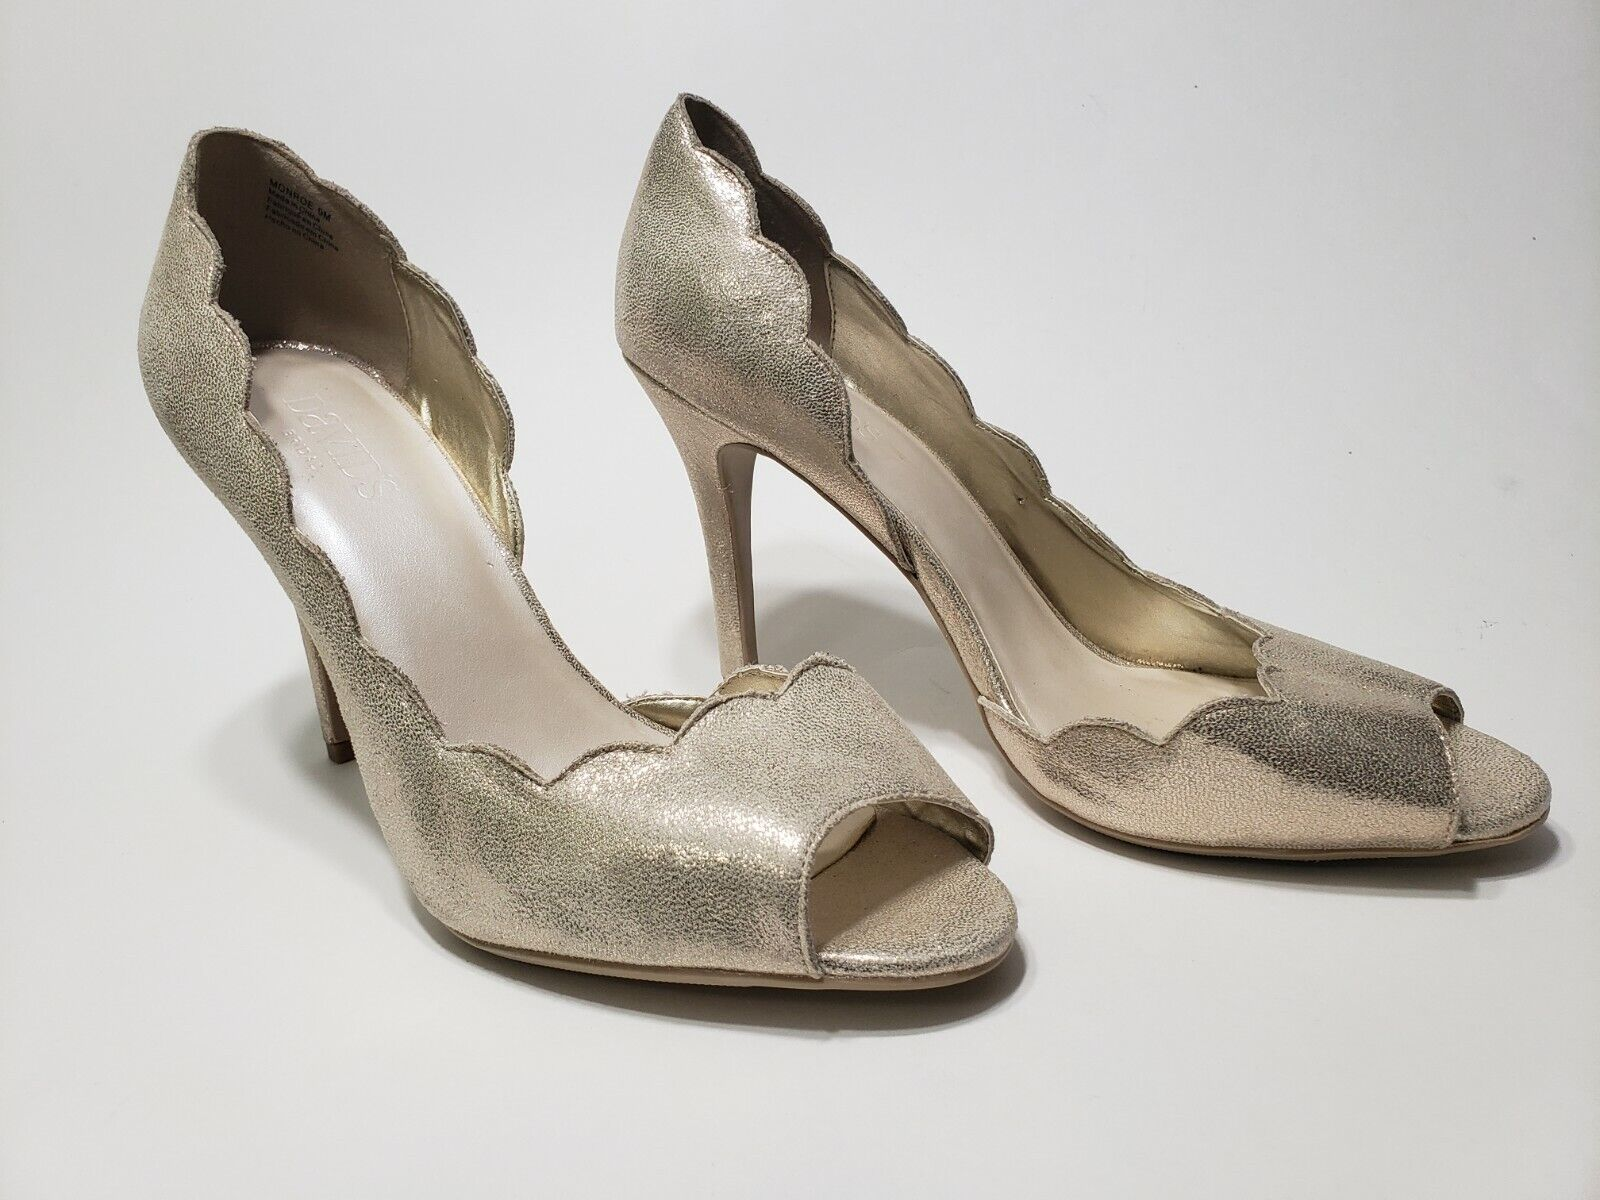 David's Bridal Open Toe Scalloped Shimmering Pumps Wedding Heels Size 9